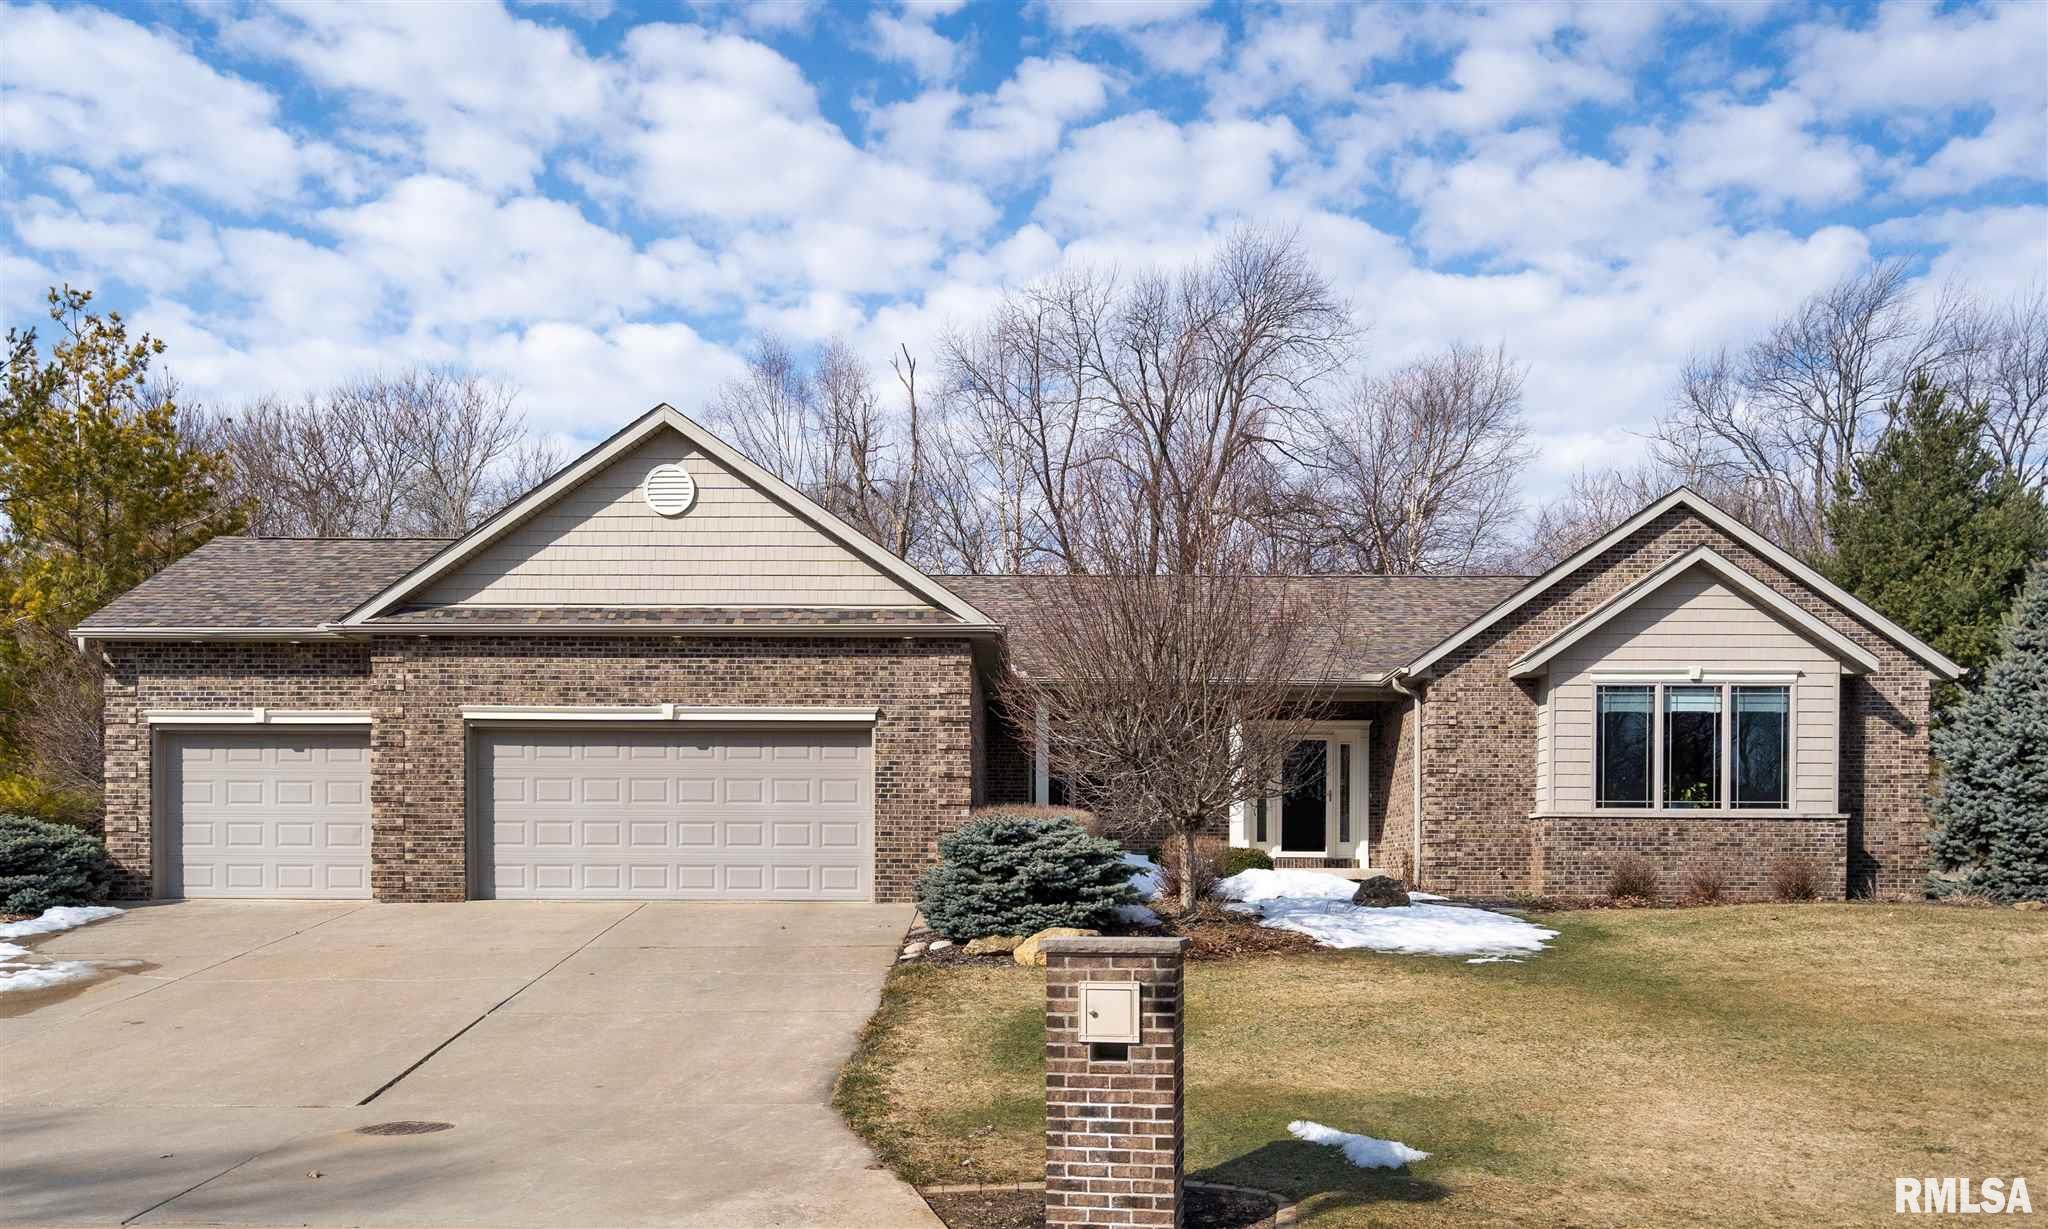 27008 GLYNNS CREEK Property Photo - Eldridge, IA real estate listing